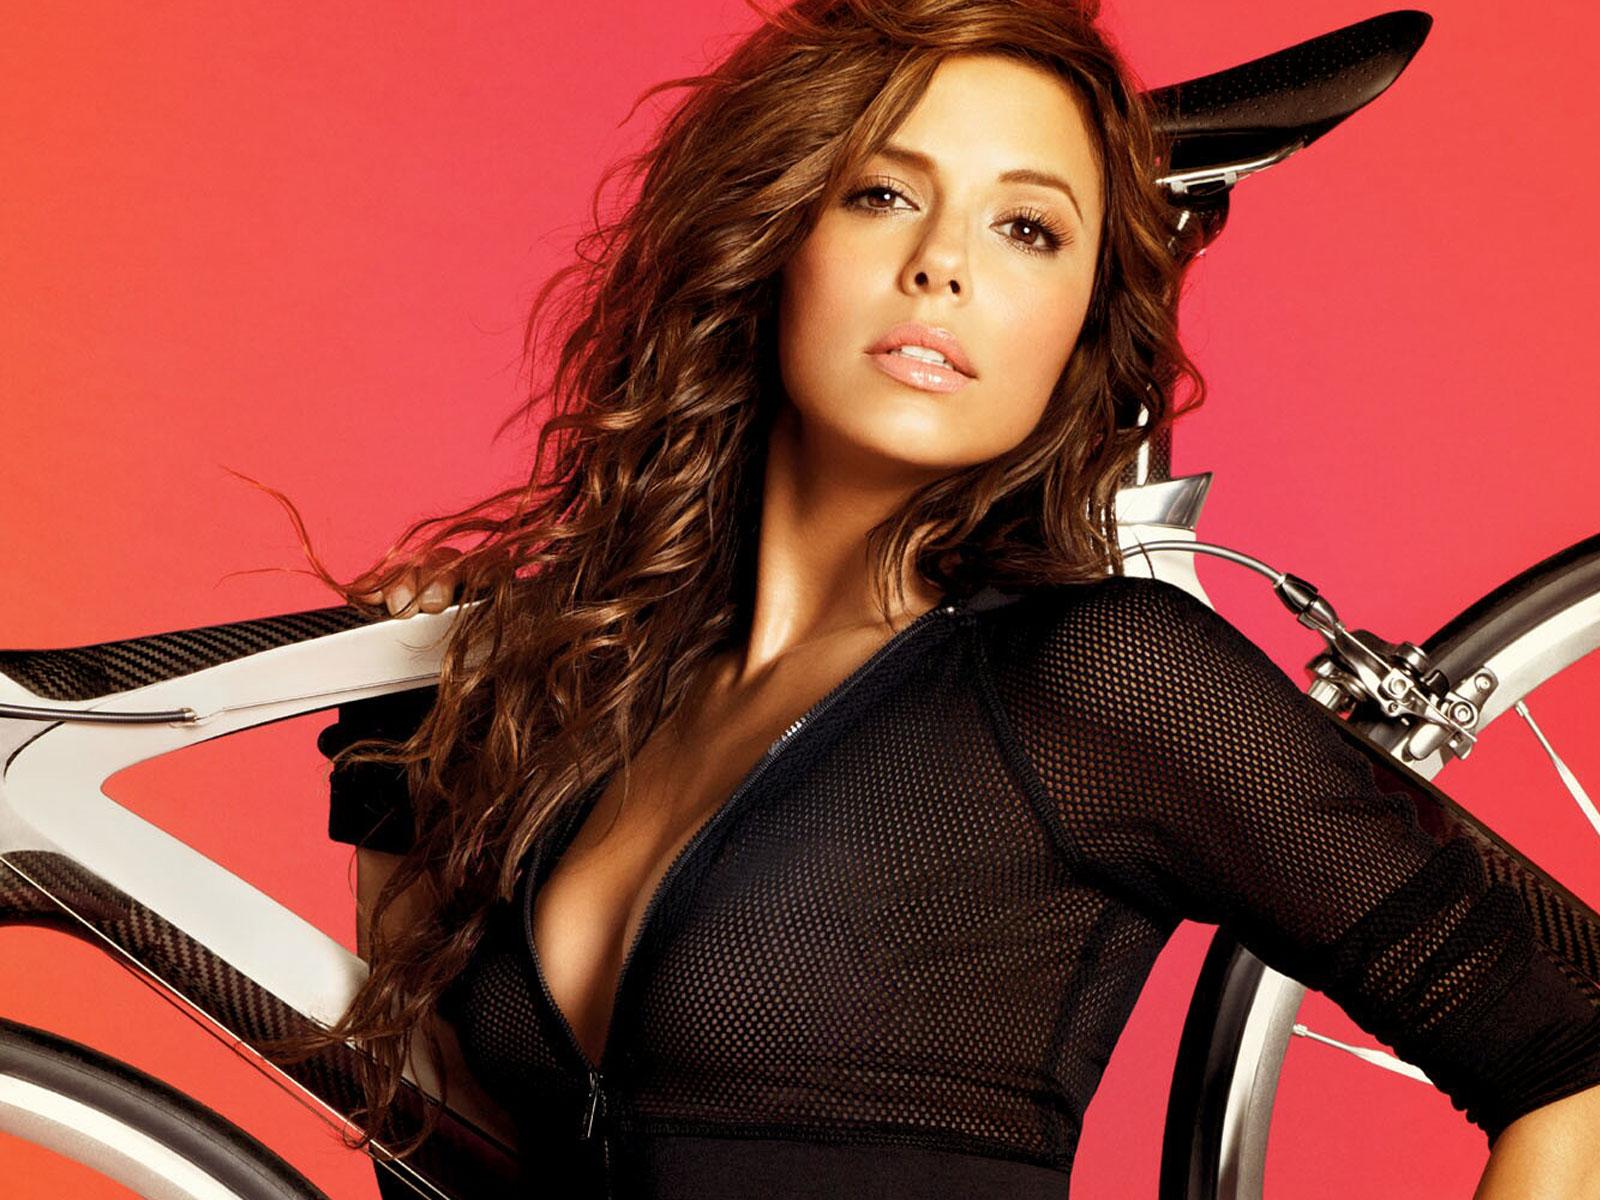 http://1.bp.blogspot.com/-DuFwsfPhWDE/Txh2qqzEH_I/AAAAAAAAGHk/GDQBI7G5K-M/s1600/eva-longoria-with-bicycle.jpg